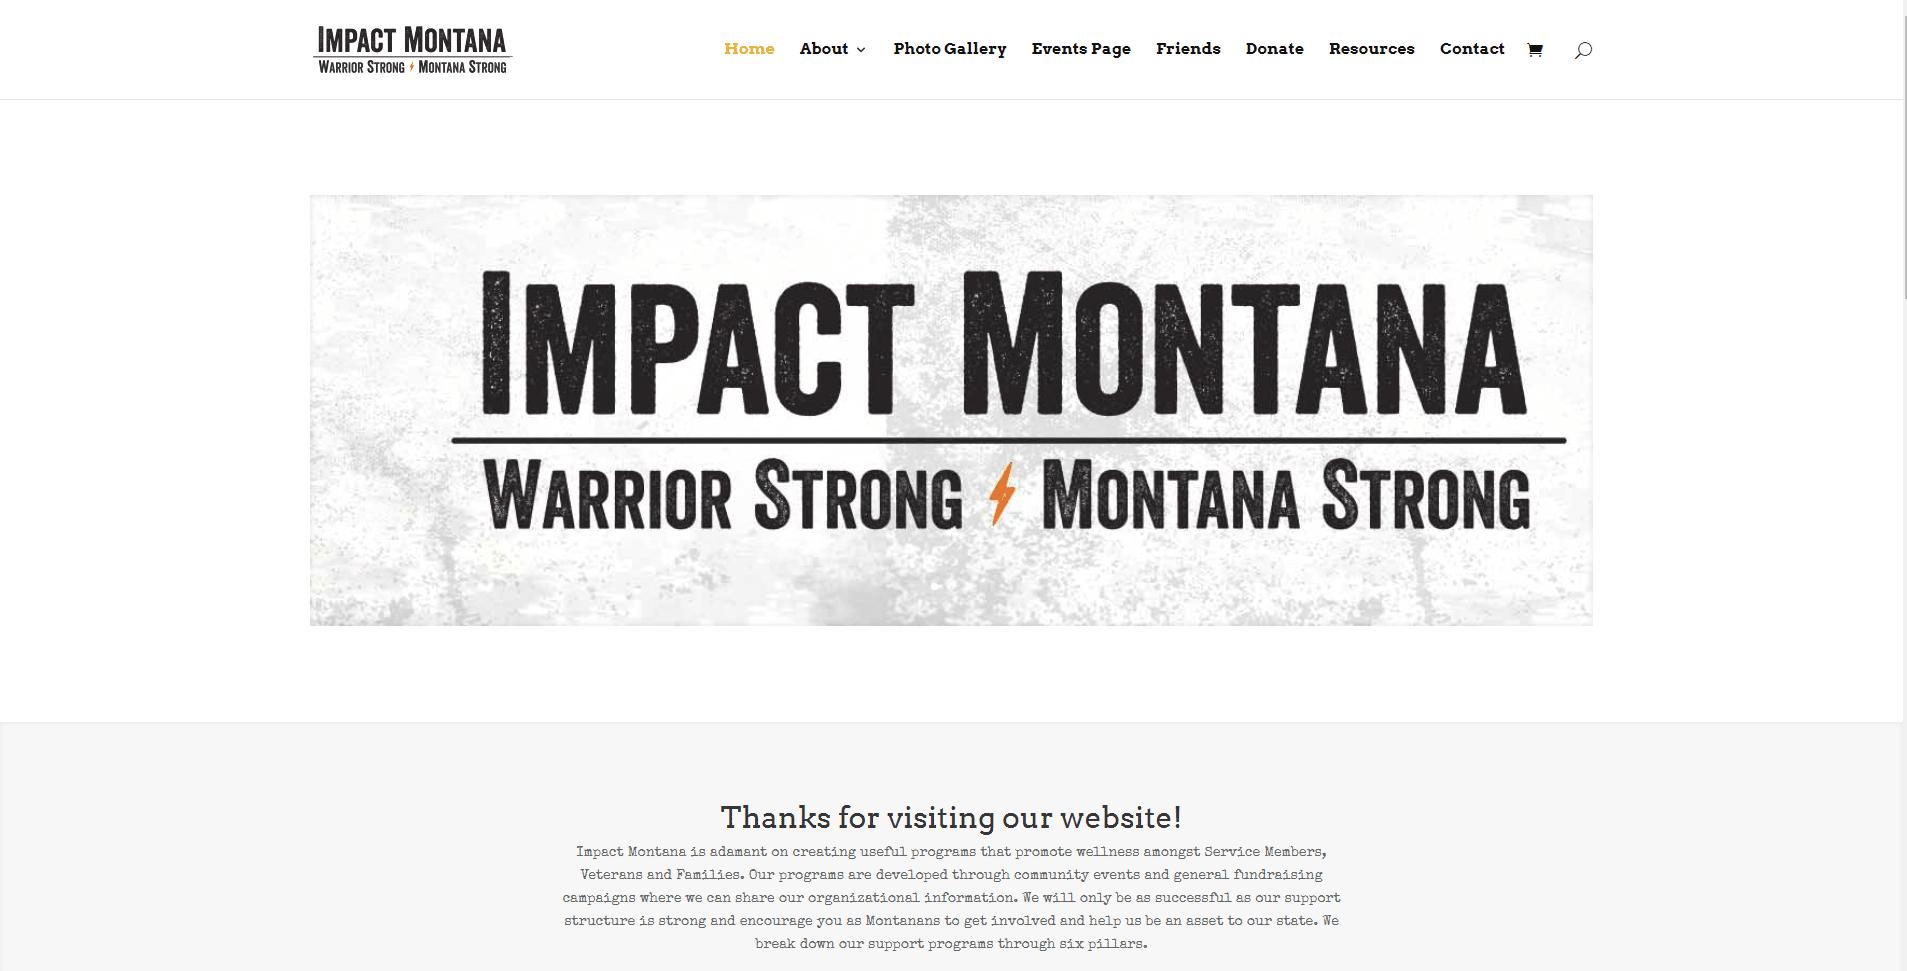 http://www.impactmontana.org